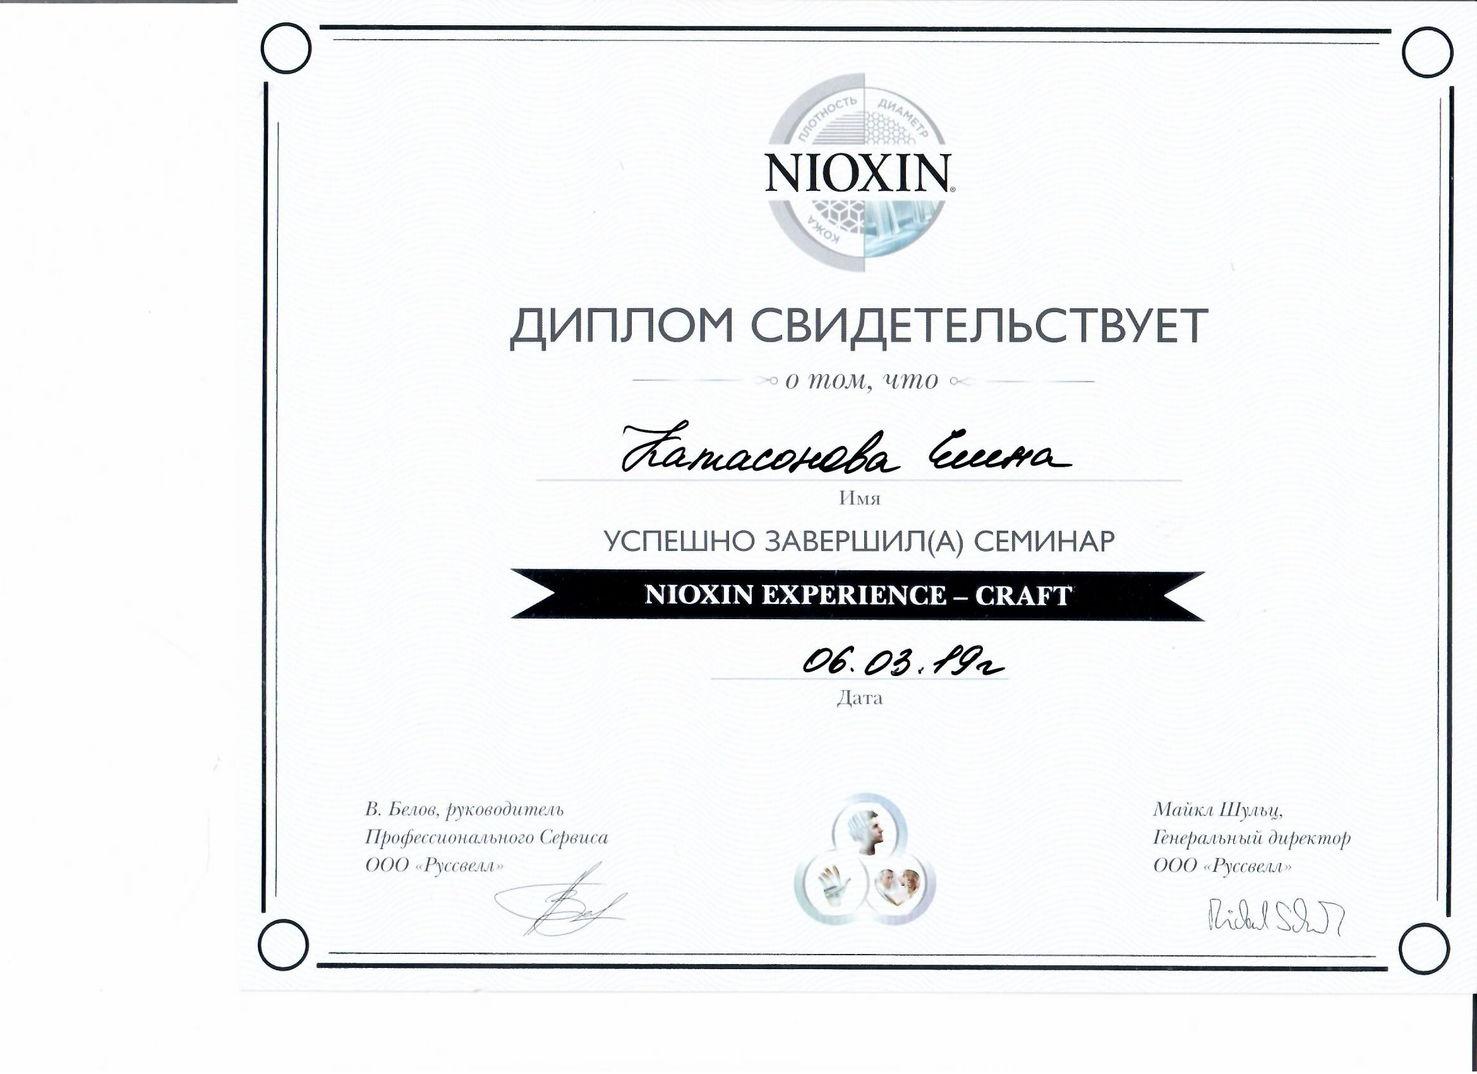 2019 nioxin experience craft